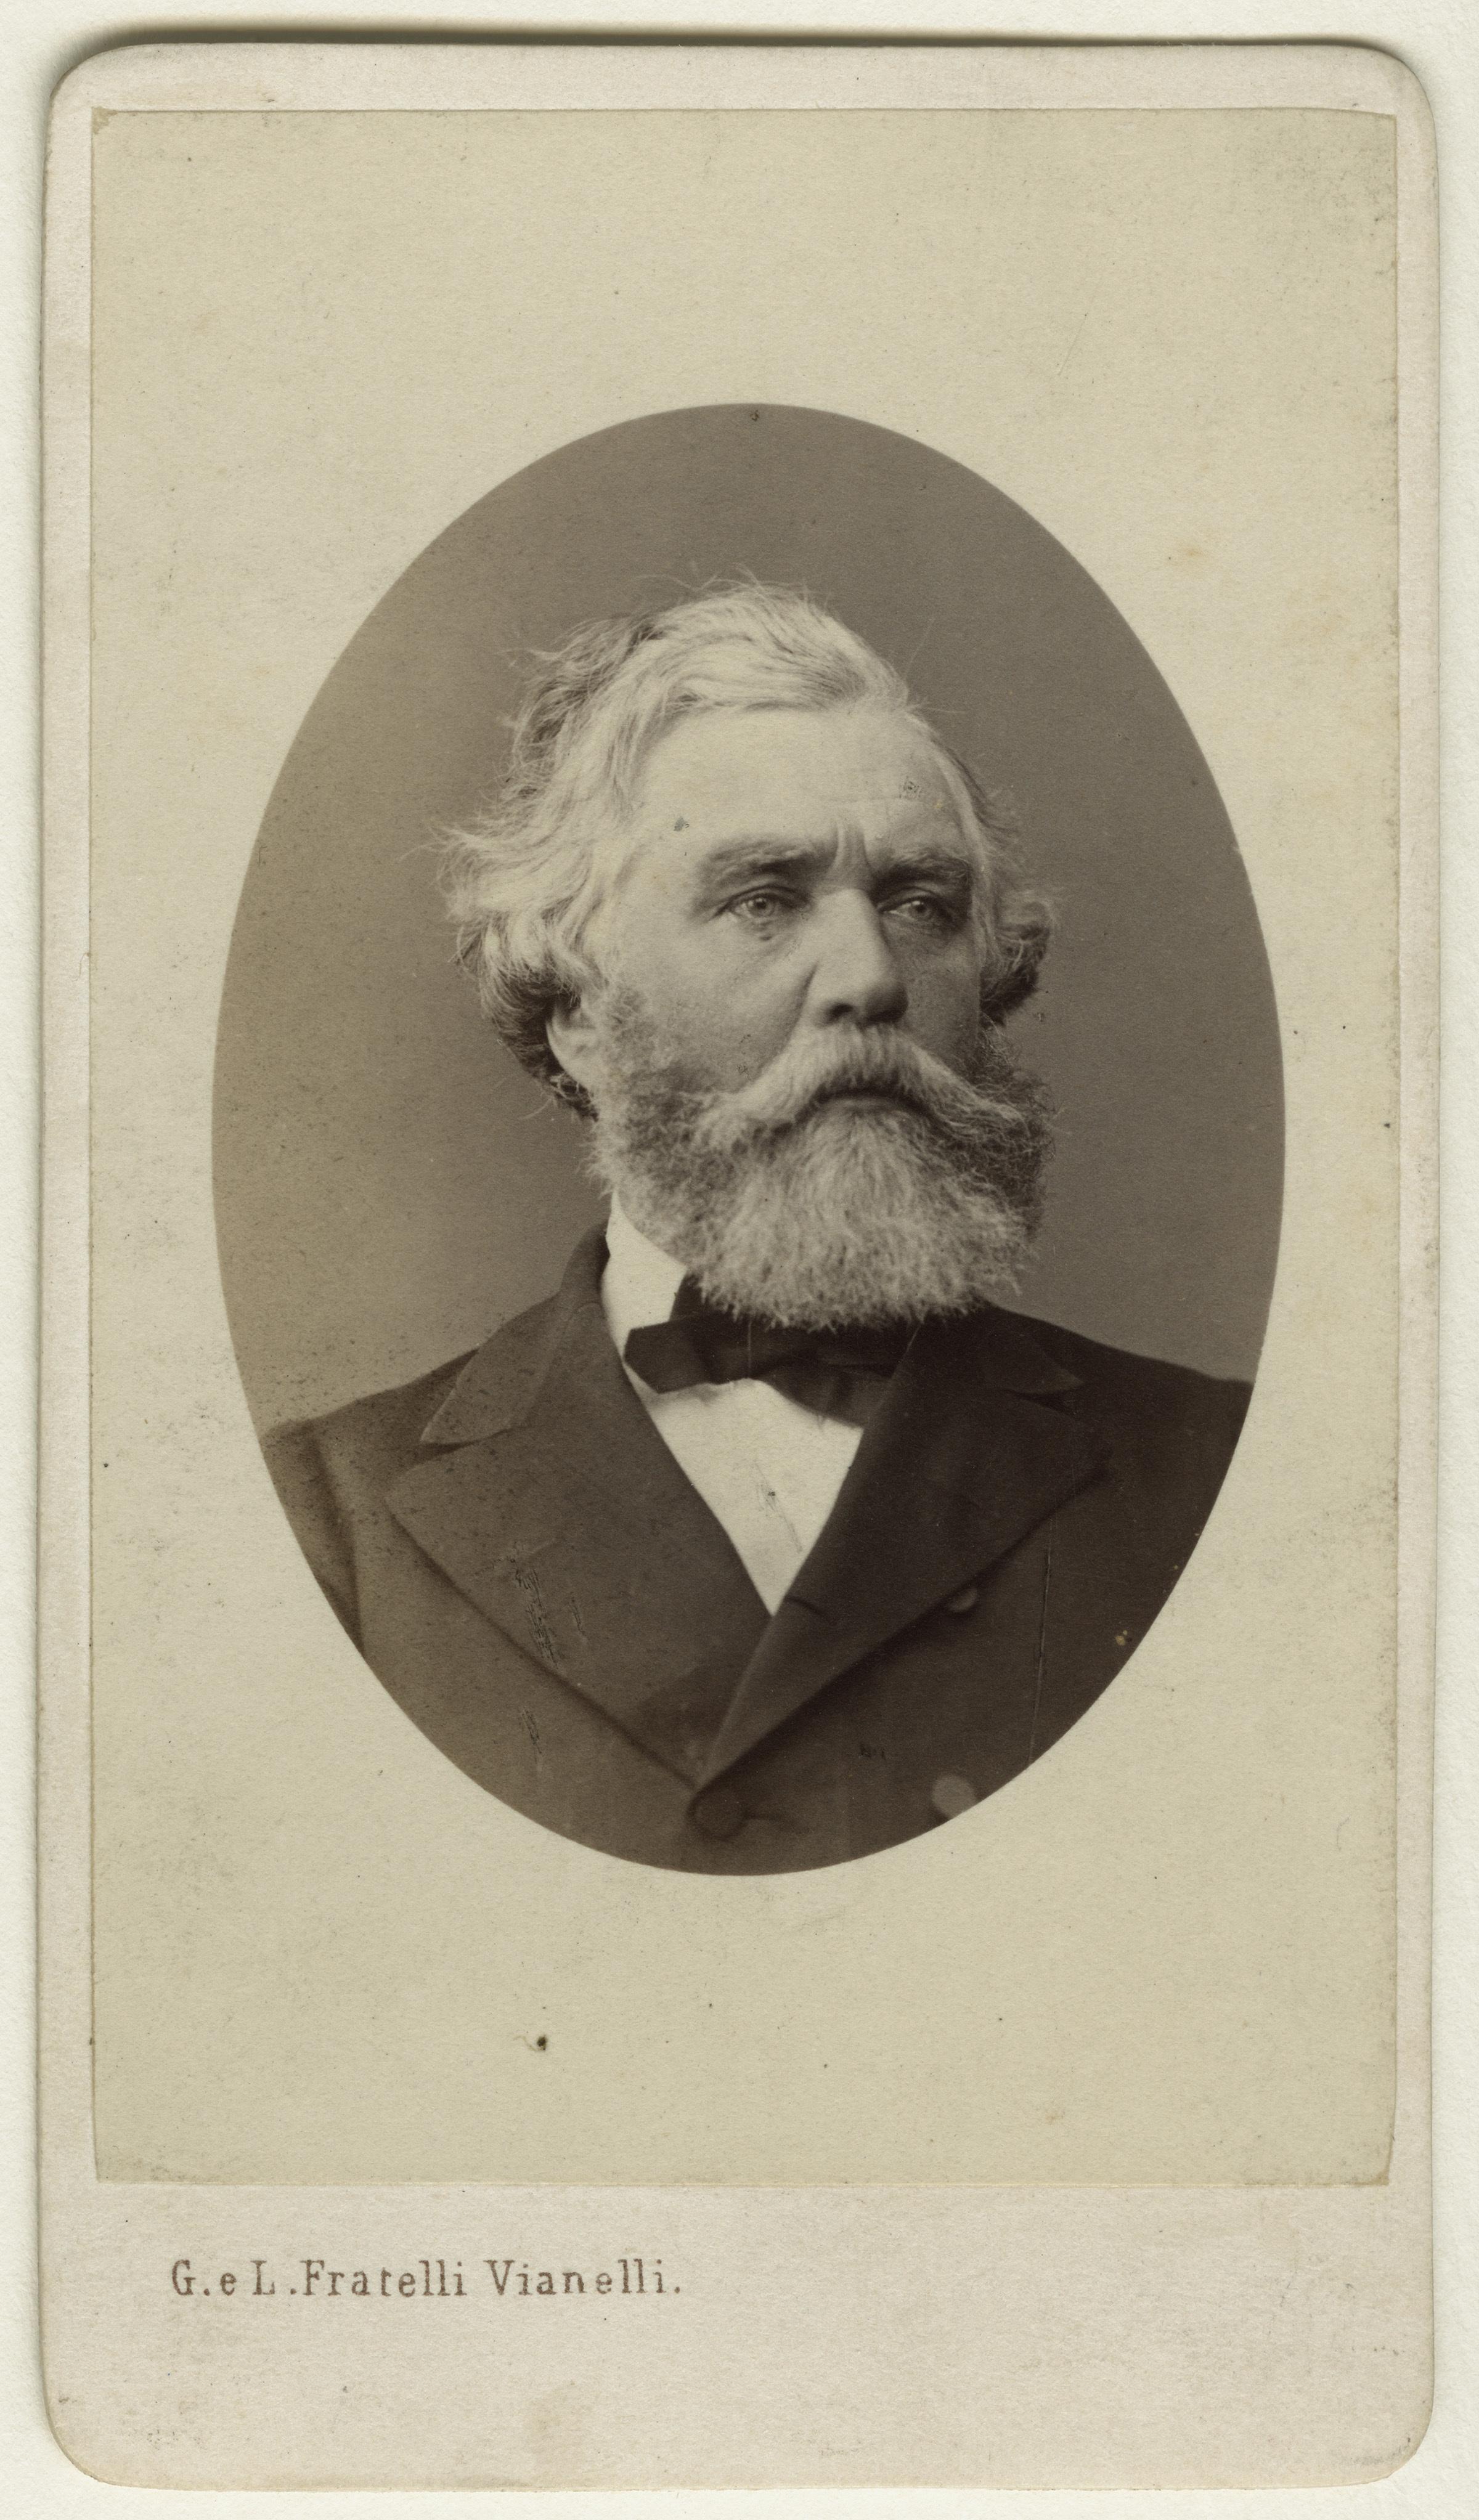 1 Fratelli Giuseppe E Luigi Vianelli Sir Austen Henry Layard 1860s Albumen Carte De Visite 63x46mm London National Portrait Gallery PG Ax17765